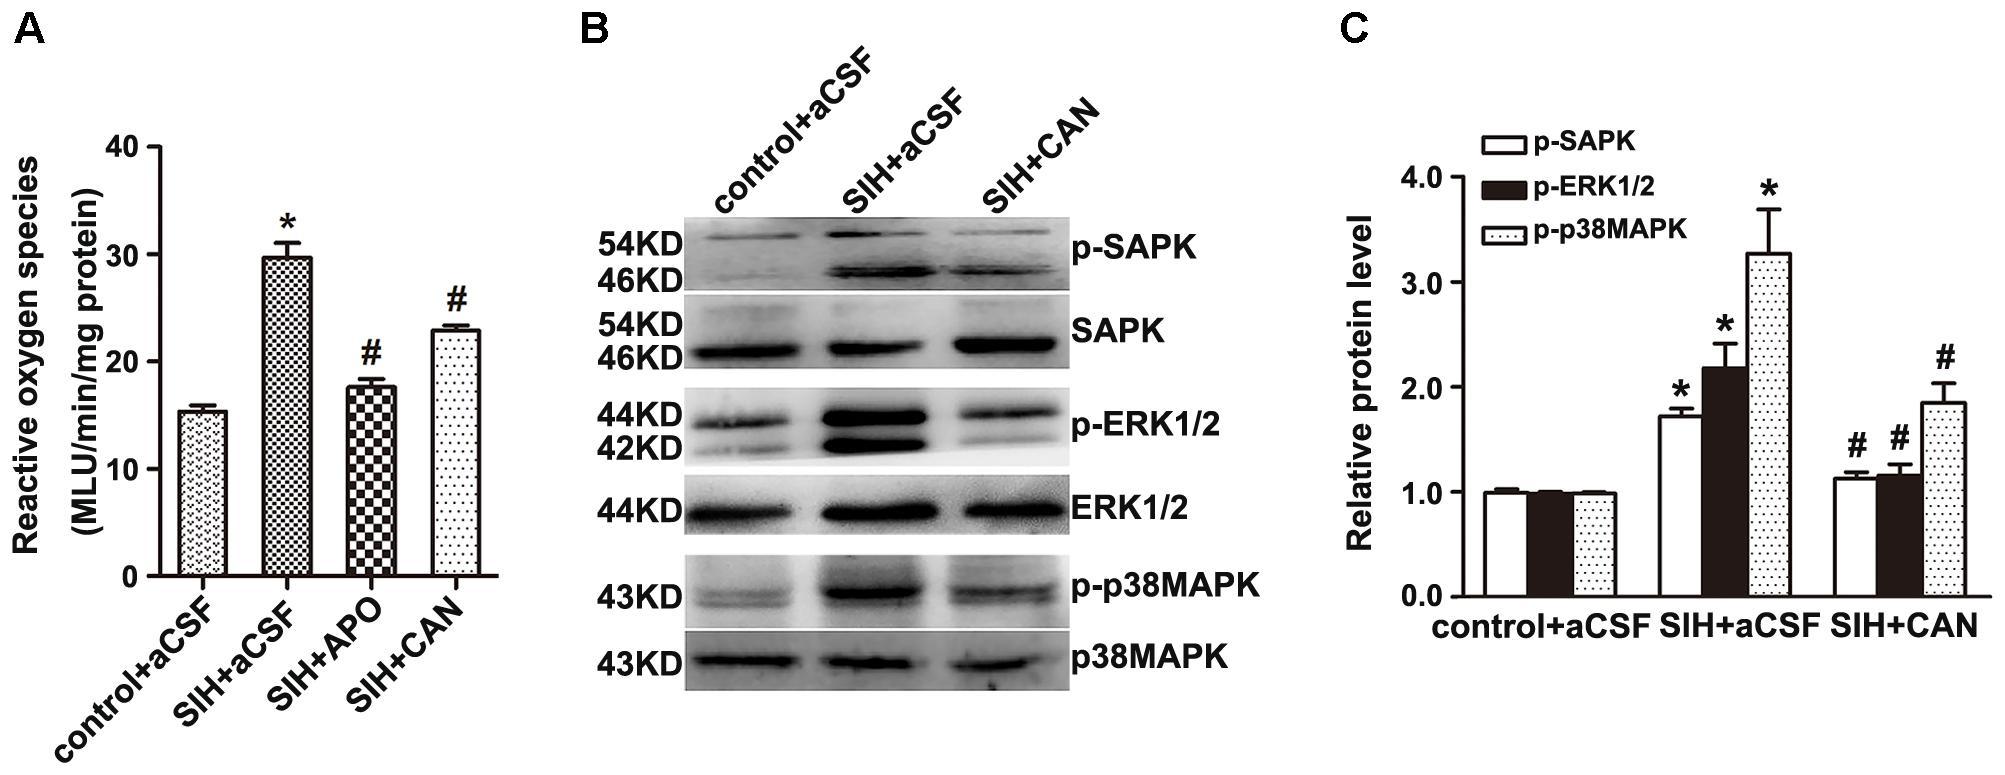 Frontiers   Upregulation of AT1 Receptor Mediates a Pressor